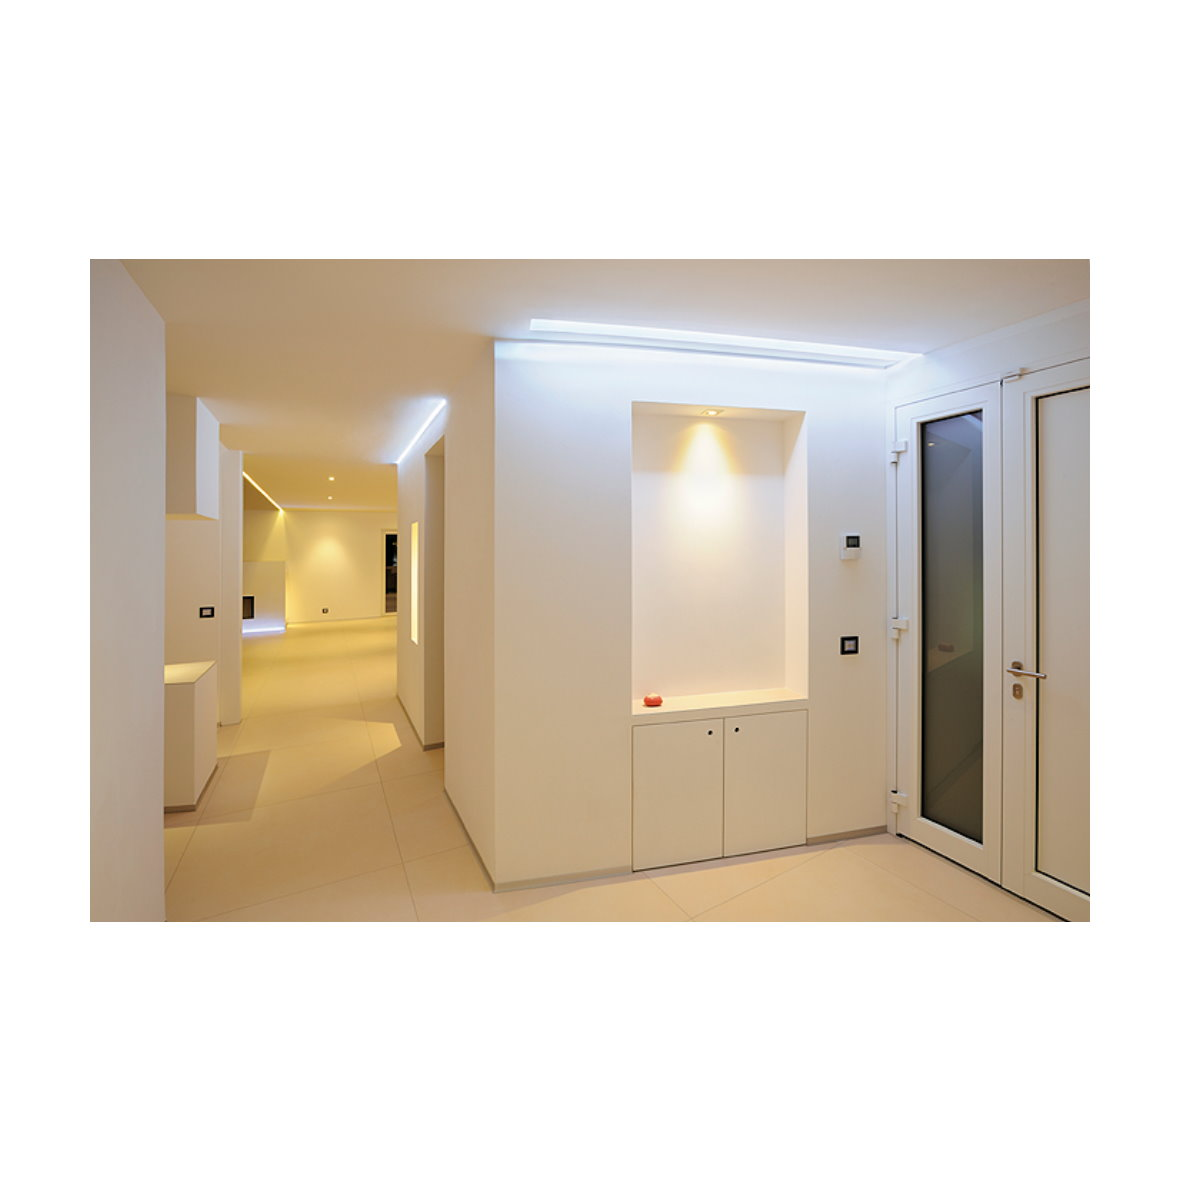 led lichtband ip44 230v mit stecker stripe schlauch dimmbar 50 500w 5 50m ebay. Black Bedroom Furniture Sets. Home Design Ideas